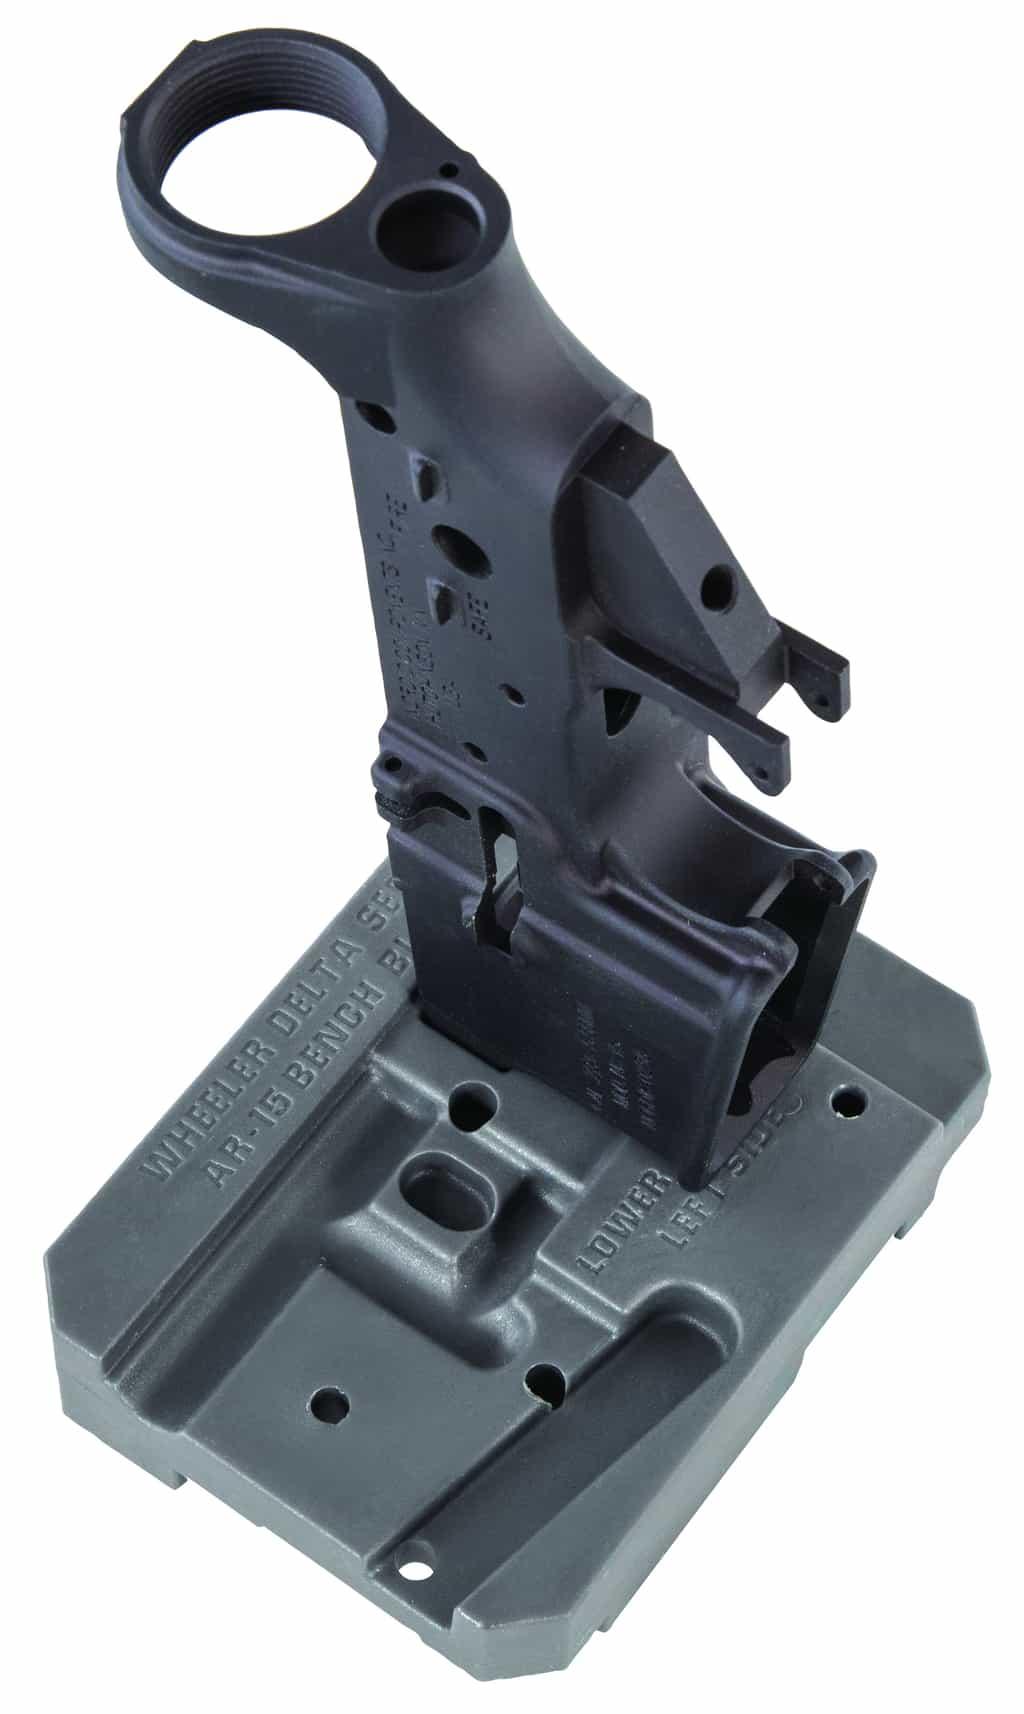 AR Armorer's Bench Block - 156945 Lower 2